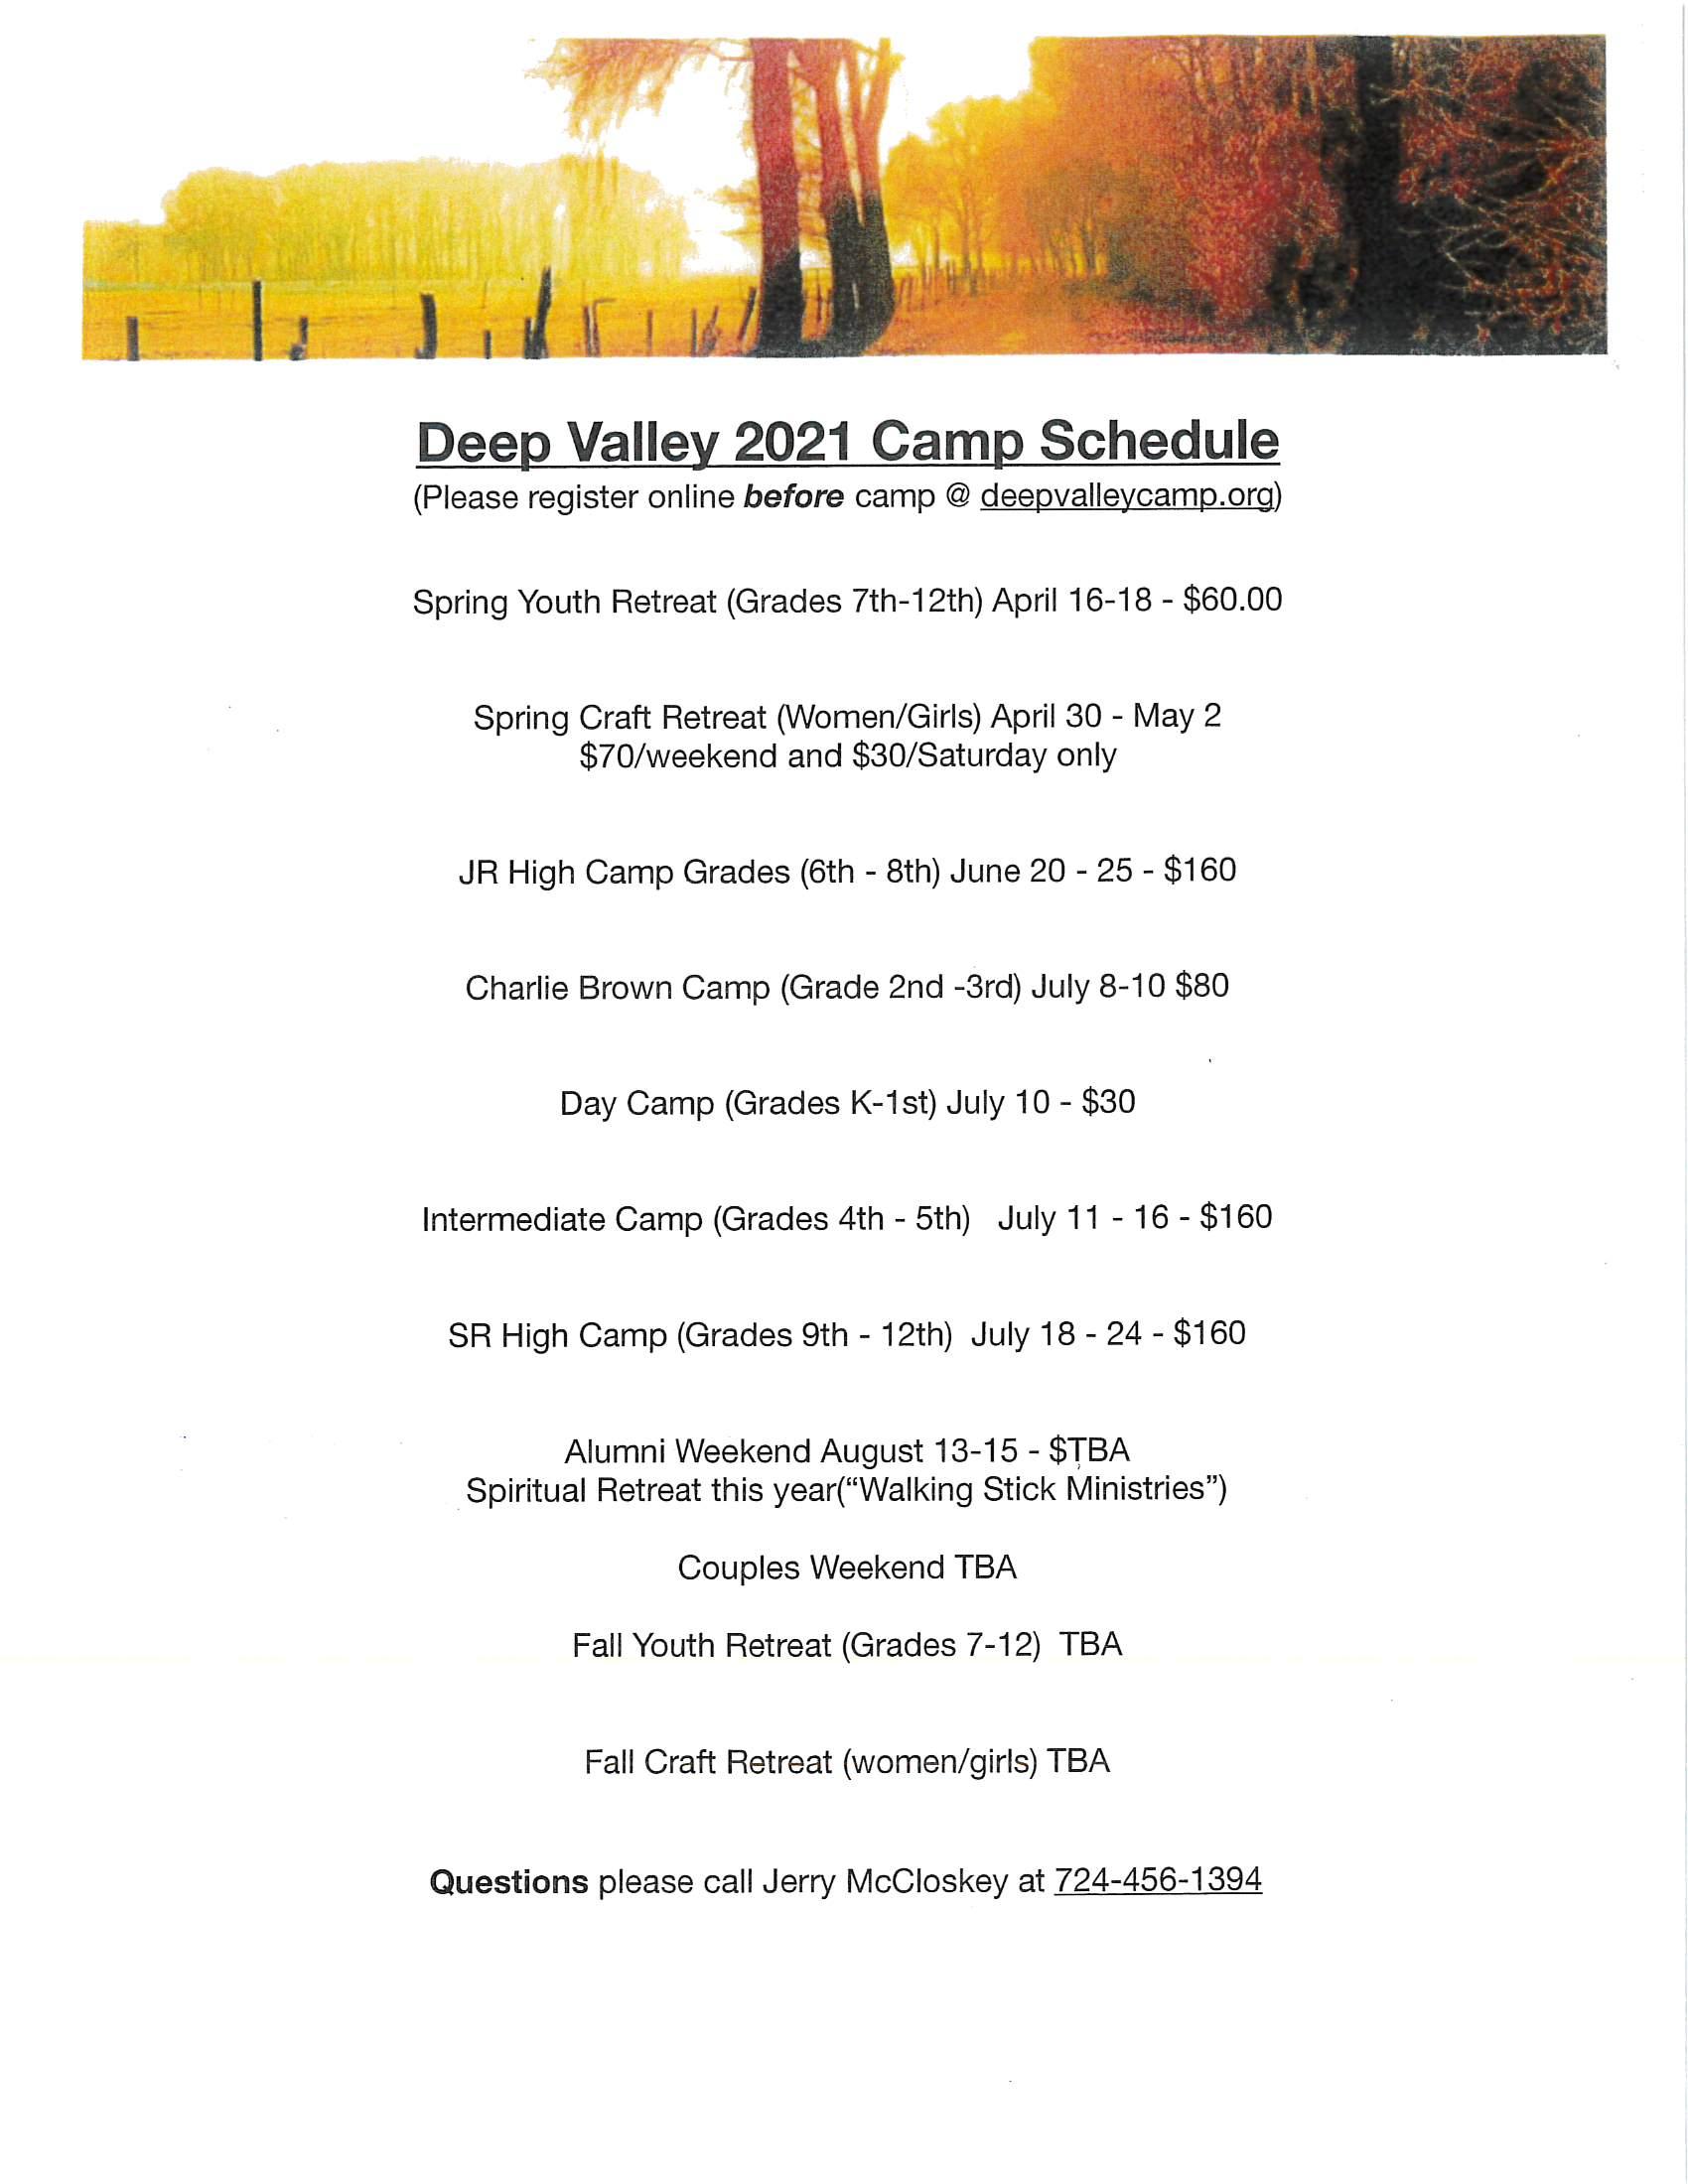 Deep Valley Camp